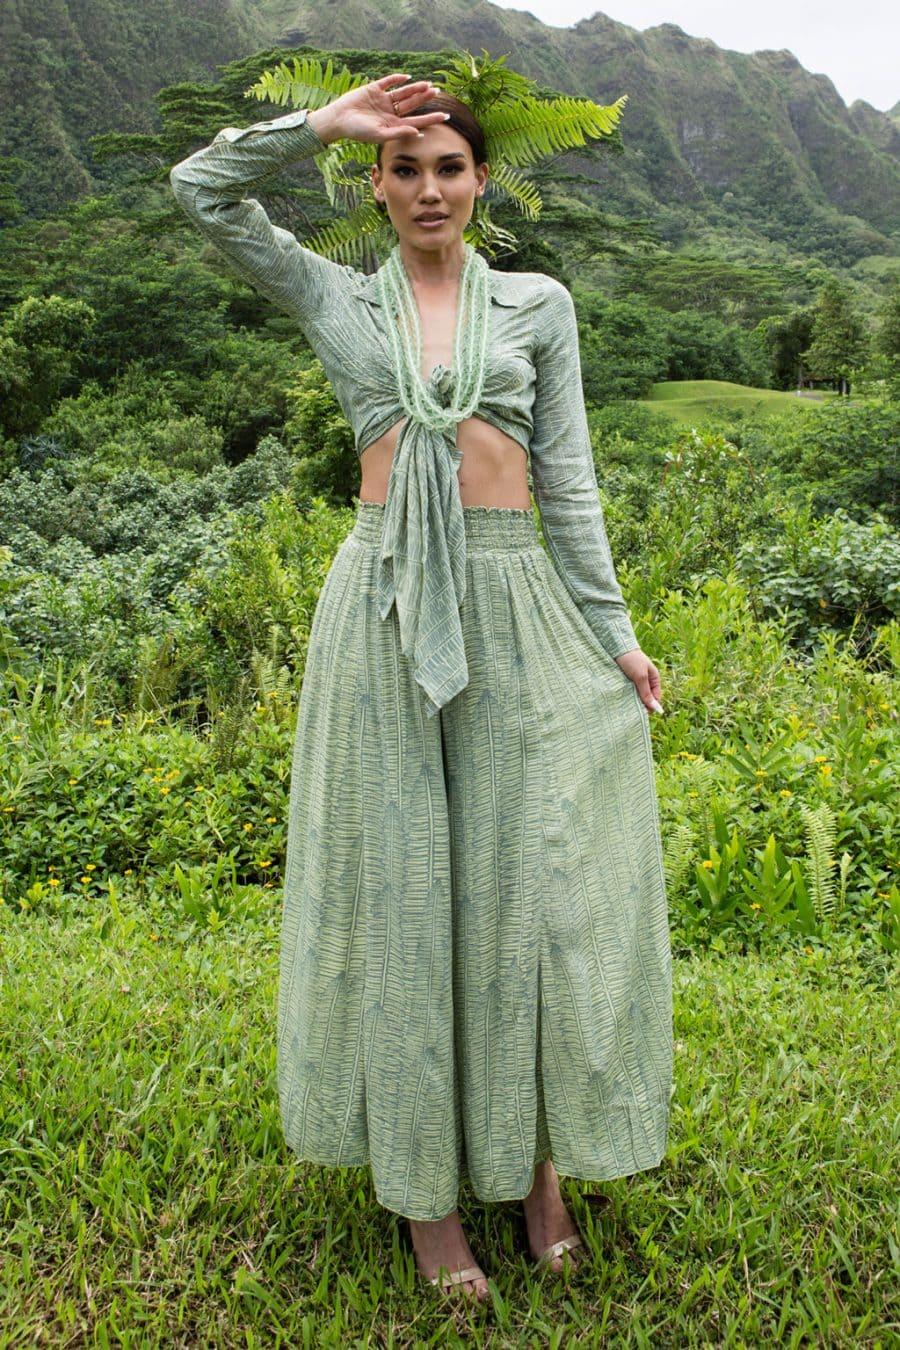 Model wearing Huaki pant in Margarita Lily Pad Kupukupu pattern